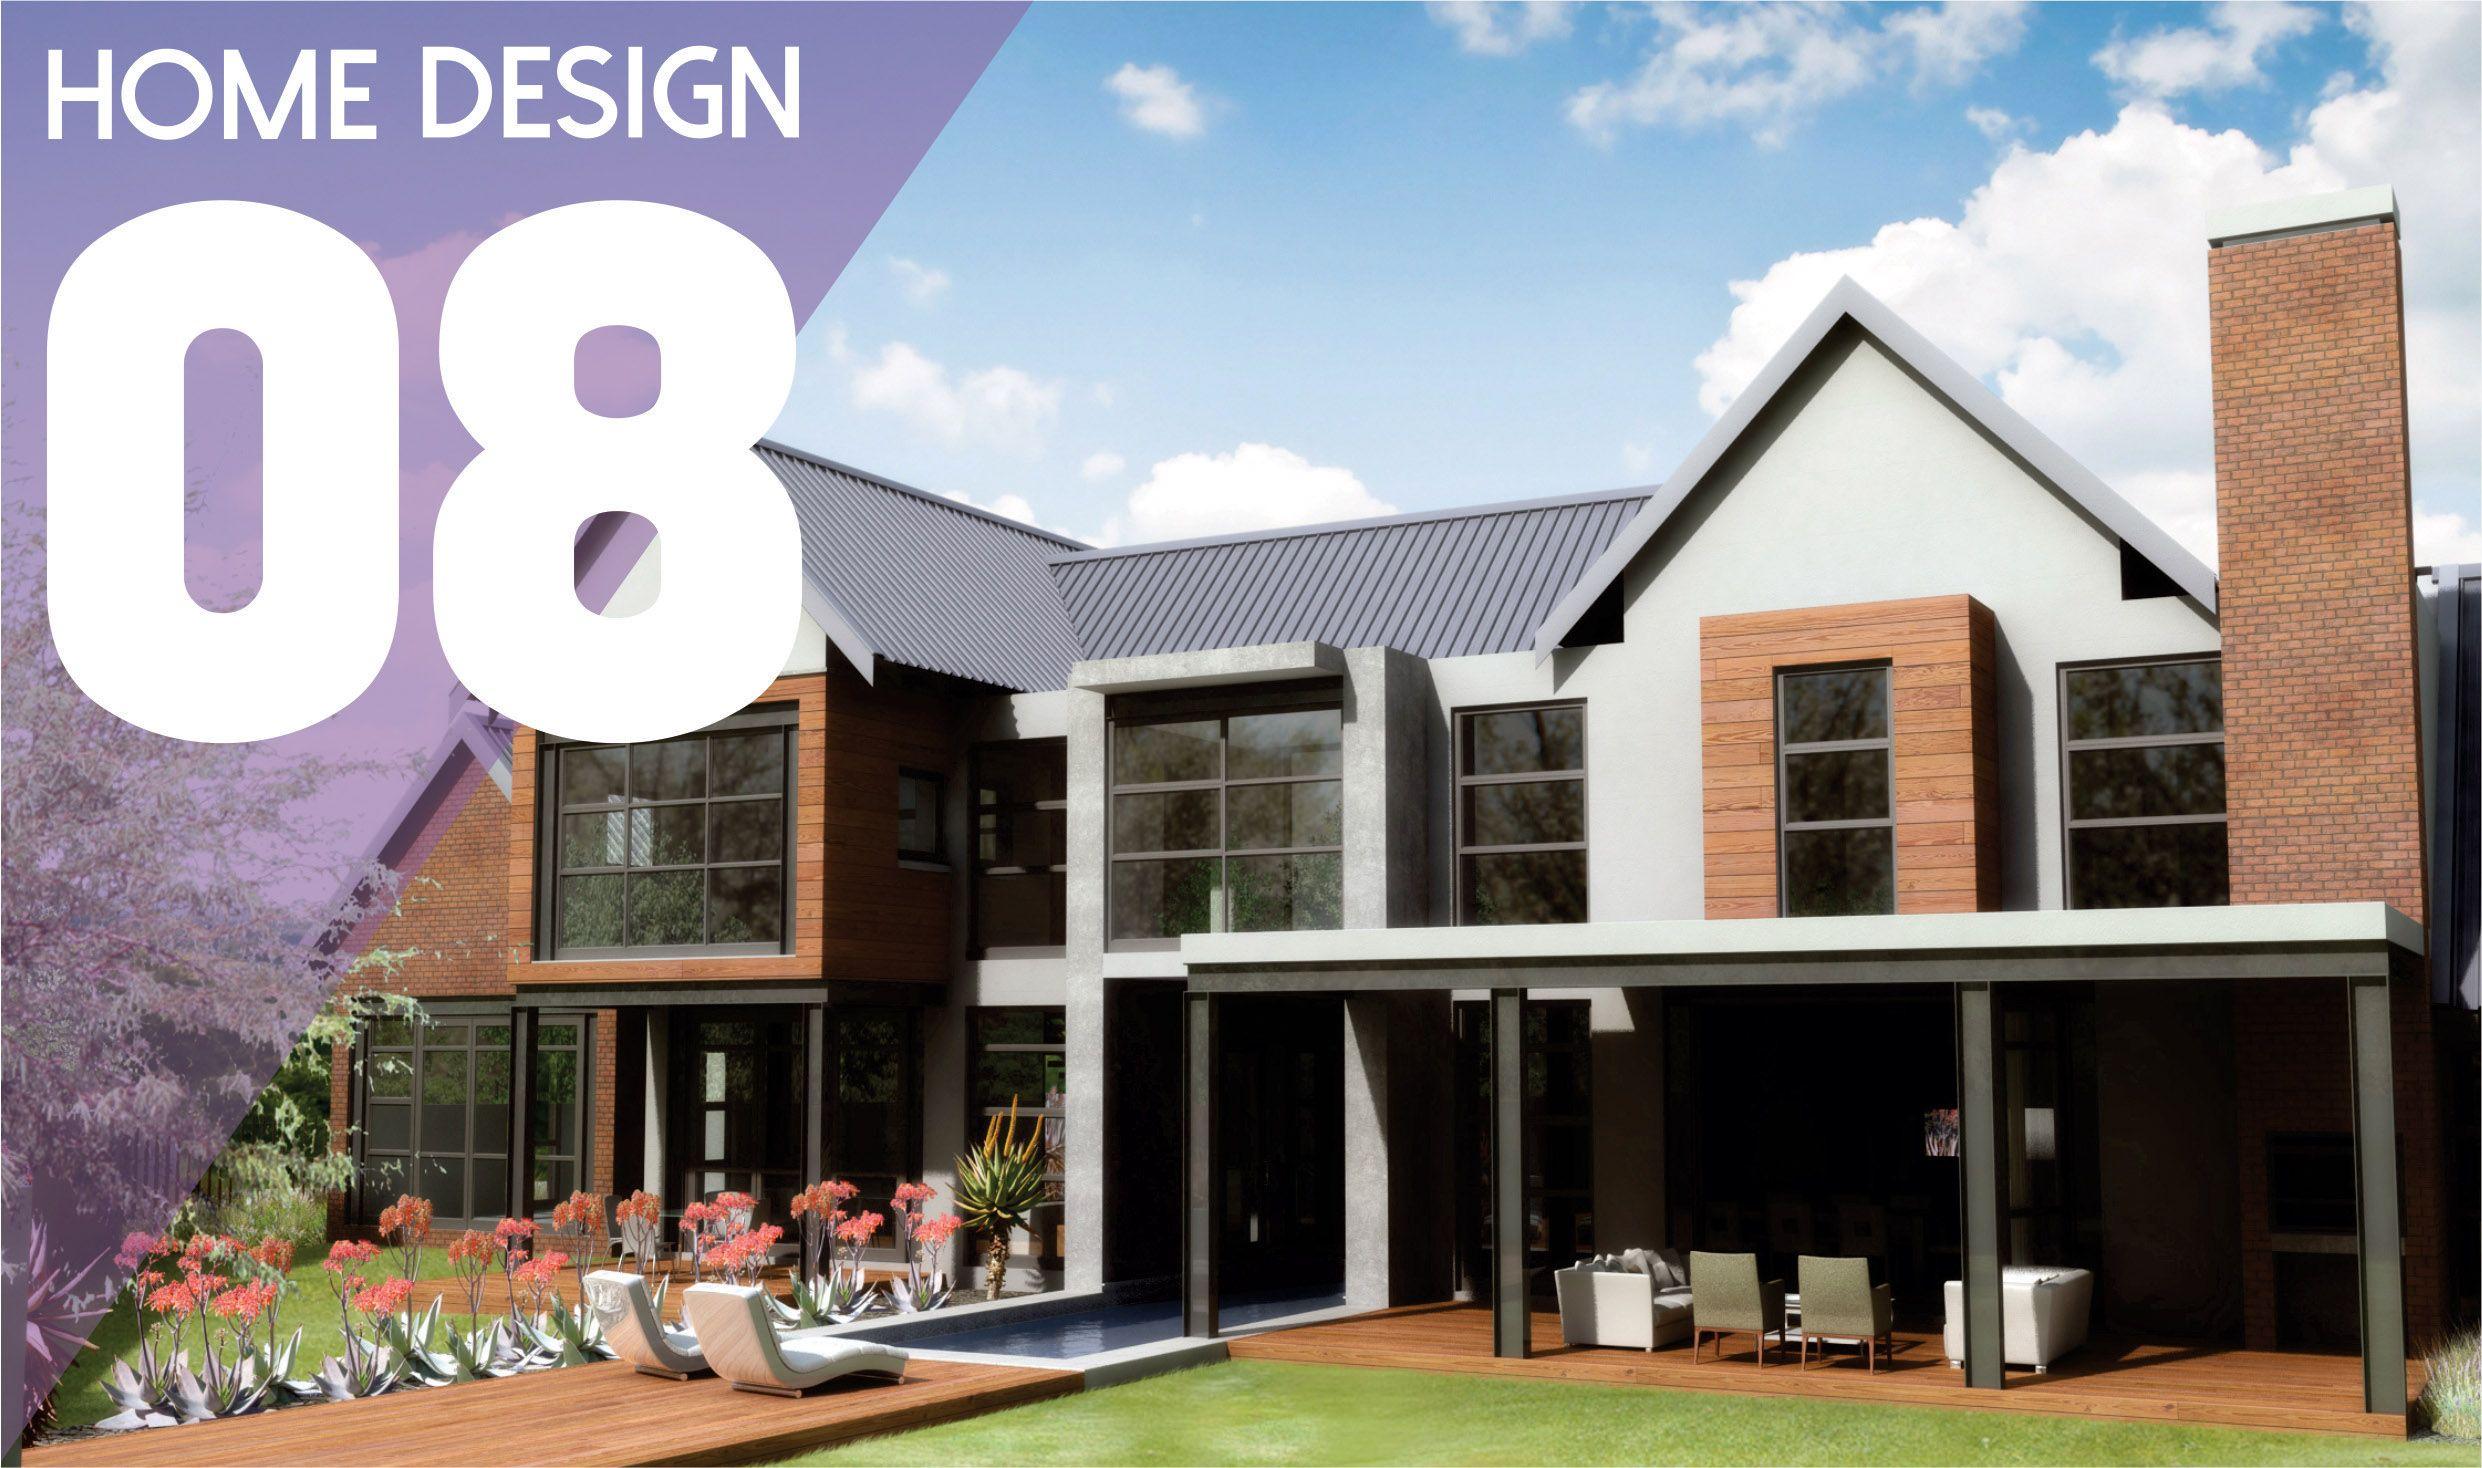 26 Home Design Expo Amazing Concept House Design Small House Design Interior Design Shows